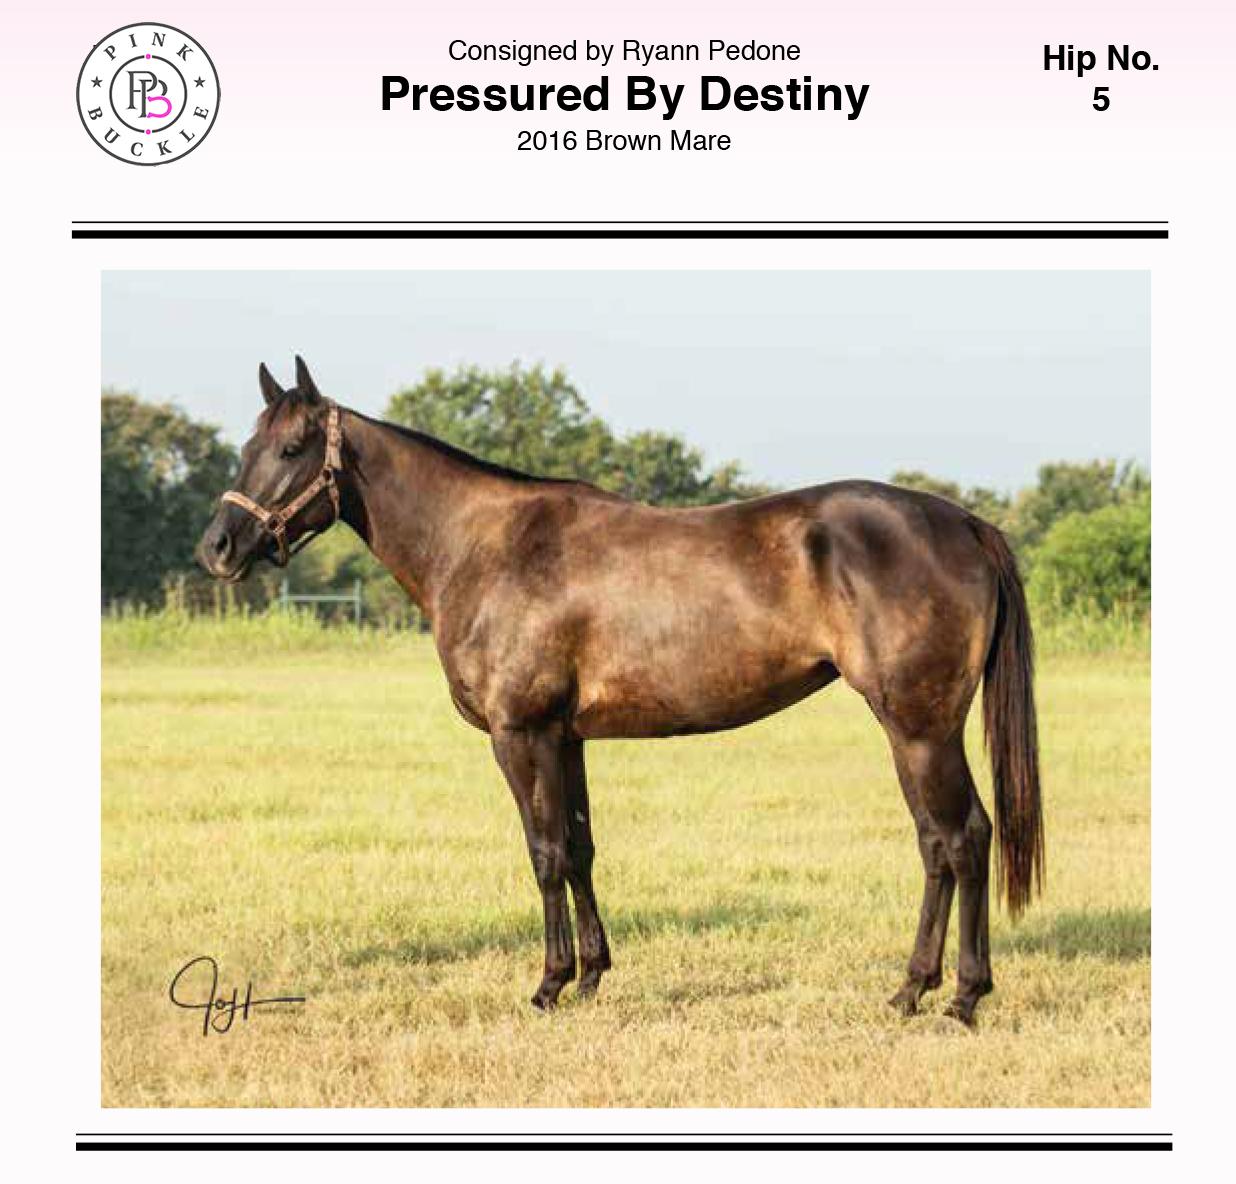 Pressured By Destiny